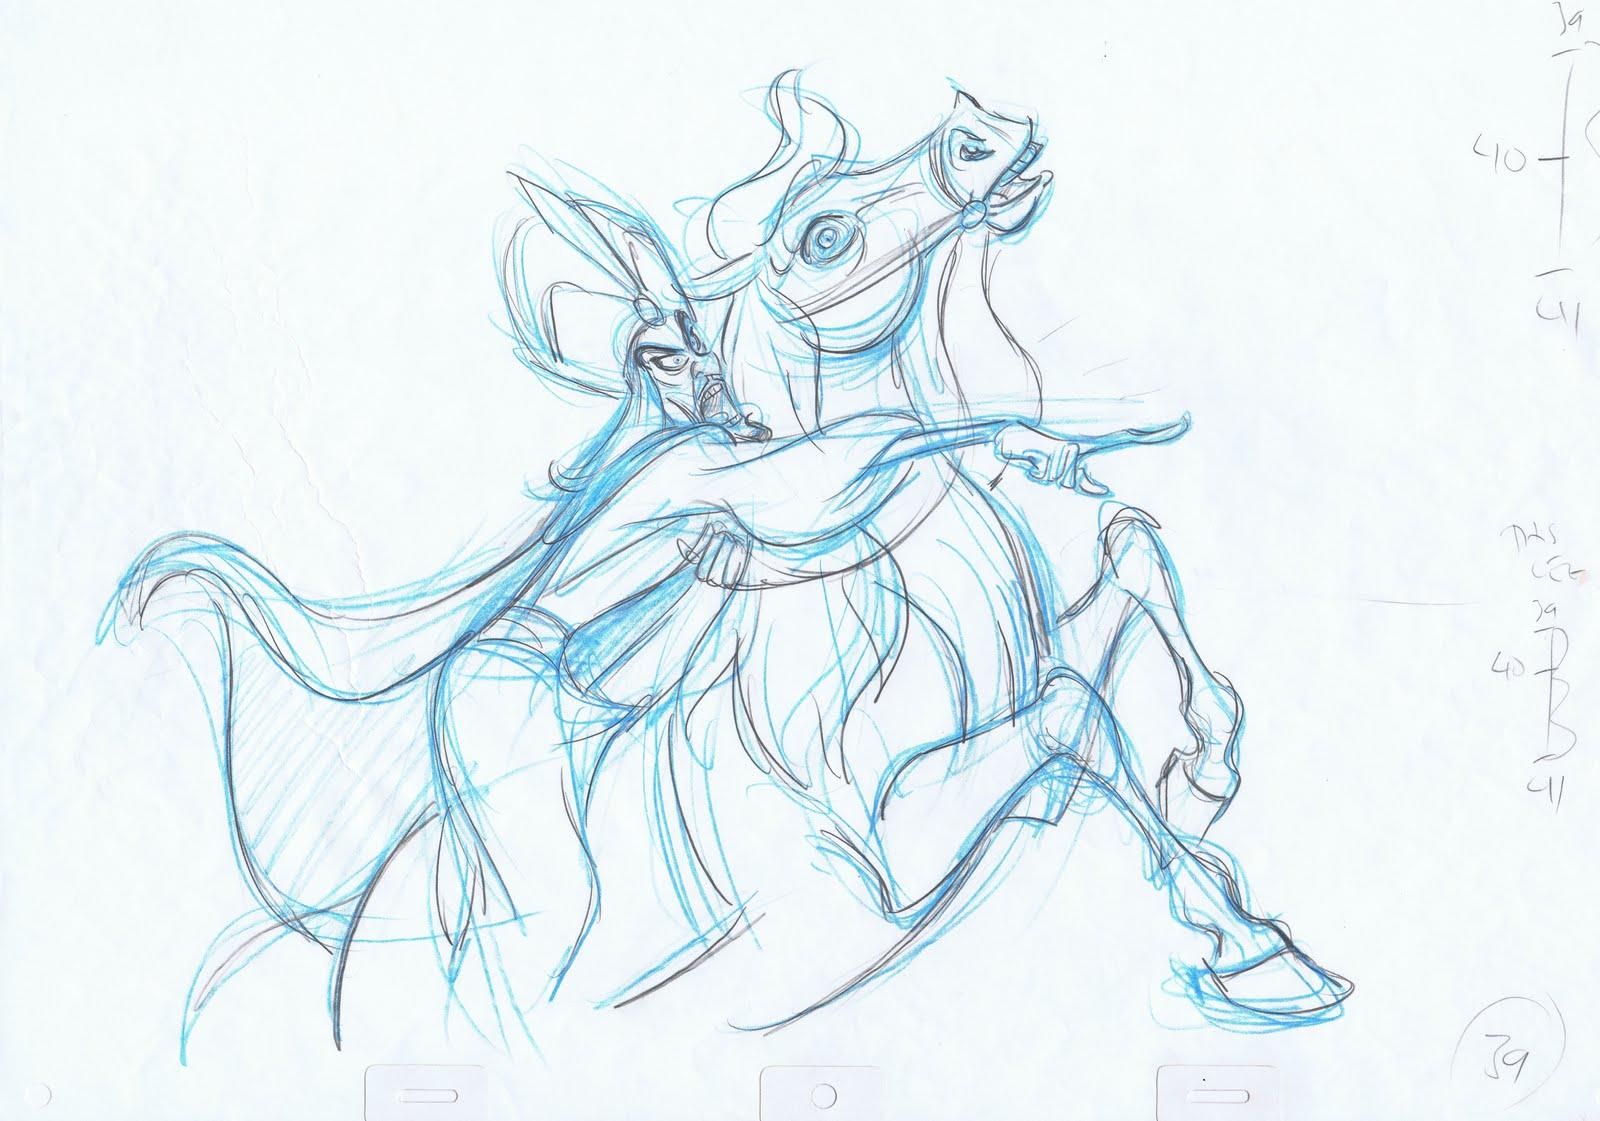 aladdin_production_drawing_andreas_deja_11.jpg